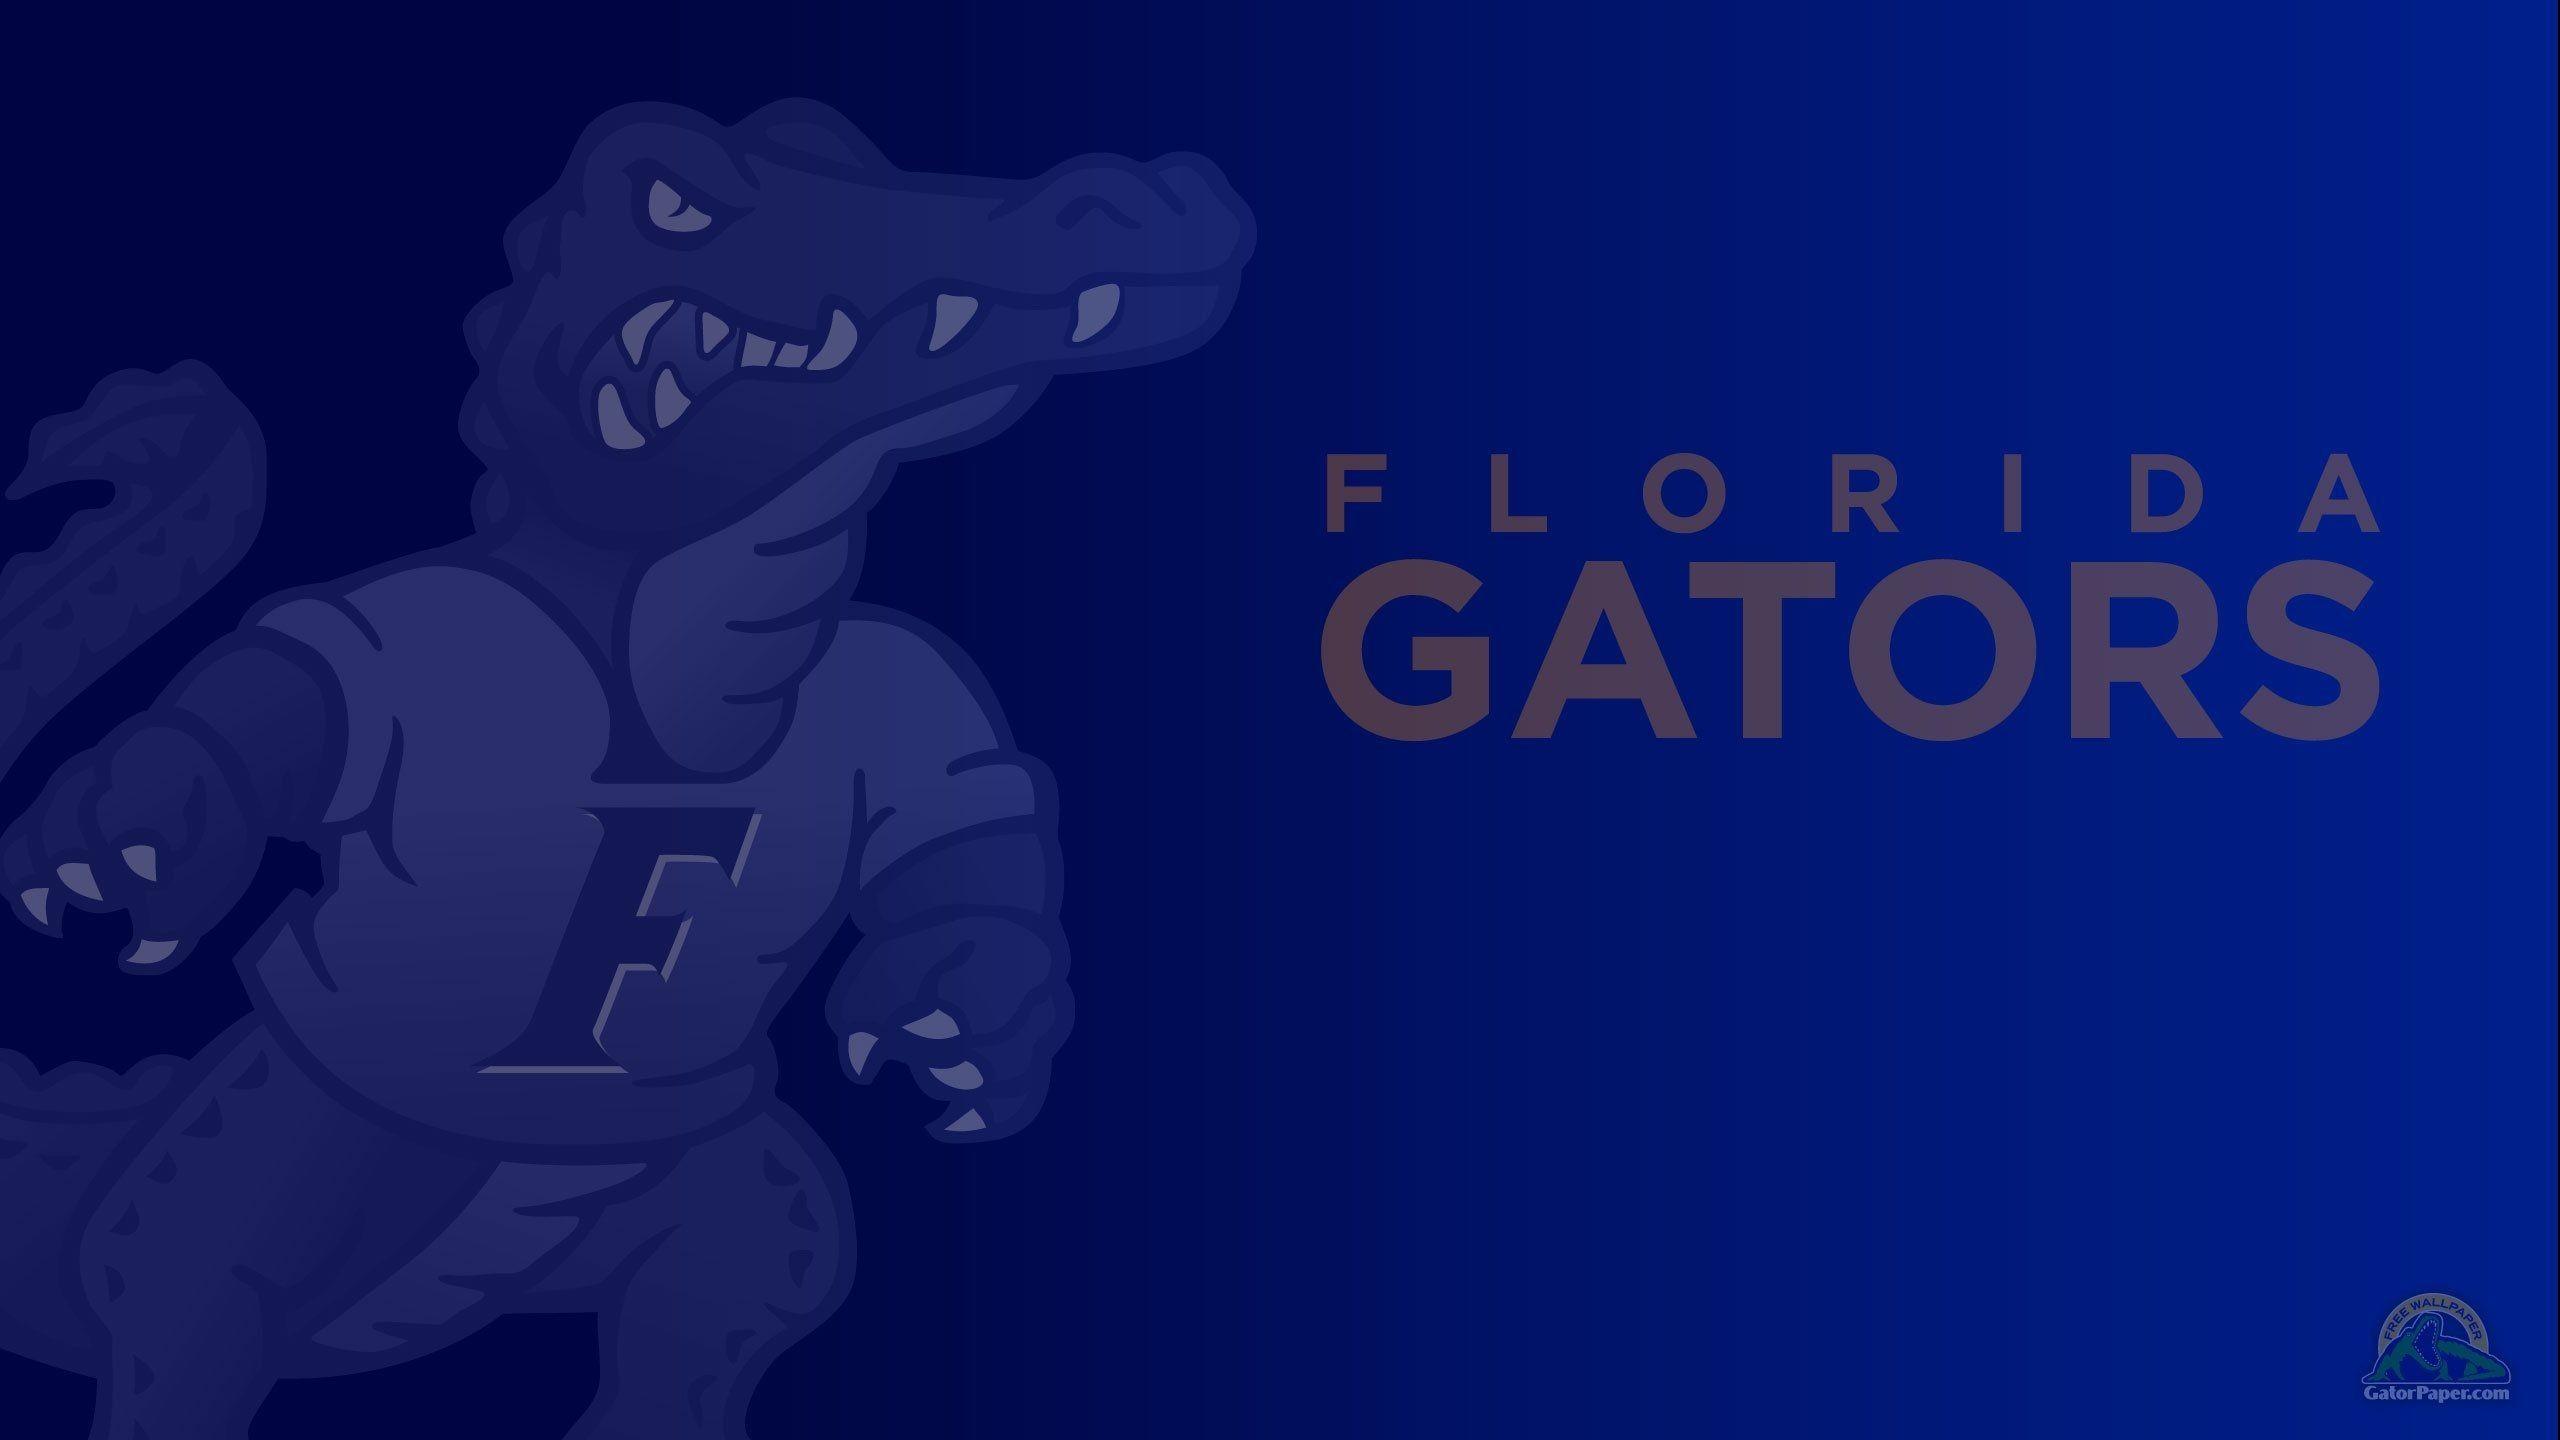 1920x1080 wallpaper.wiki-Free-Backgrounds-Florida-Gators-Download-PIC-